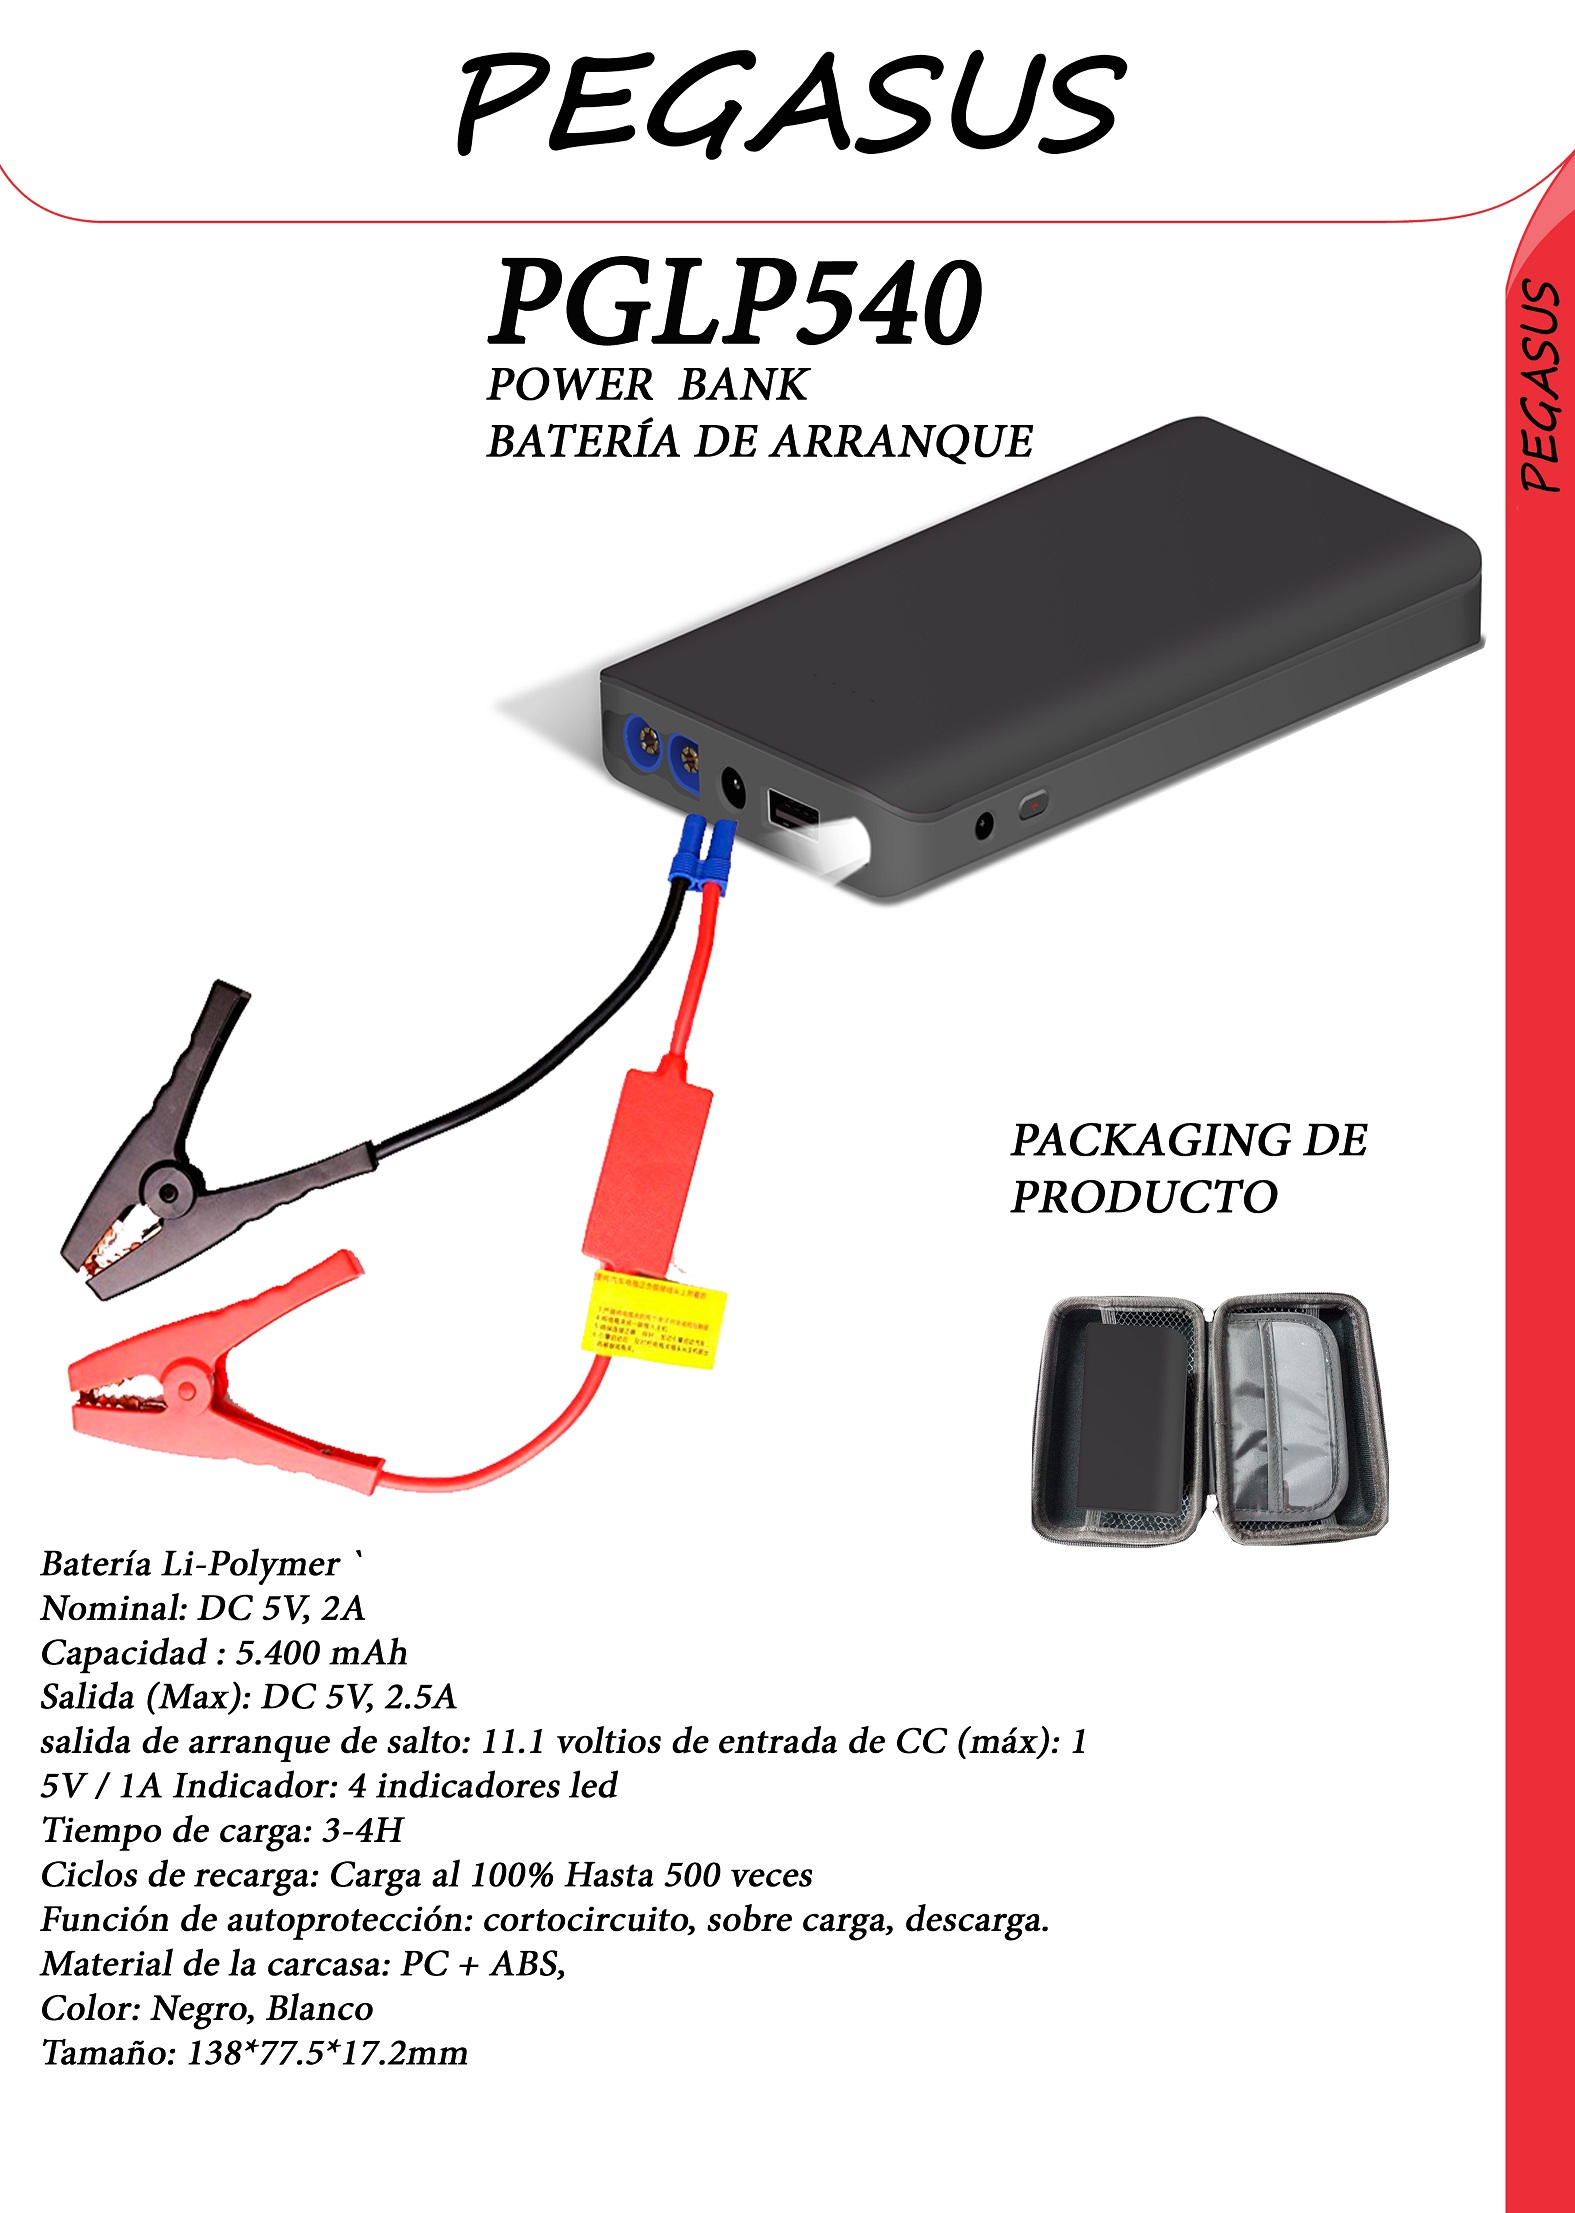 Arrancador de Batería Pegasus PGLP 540